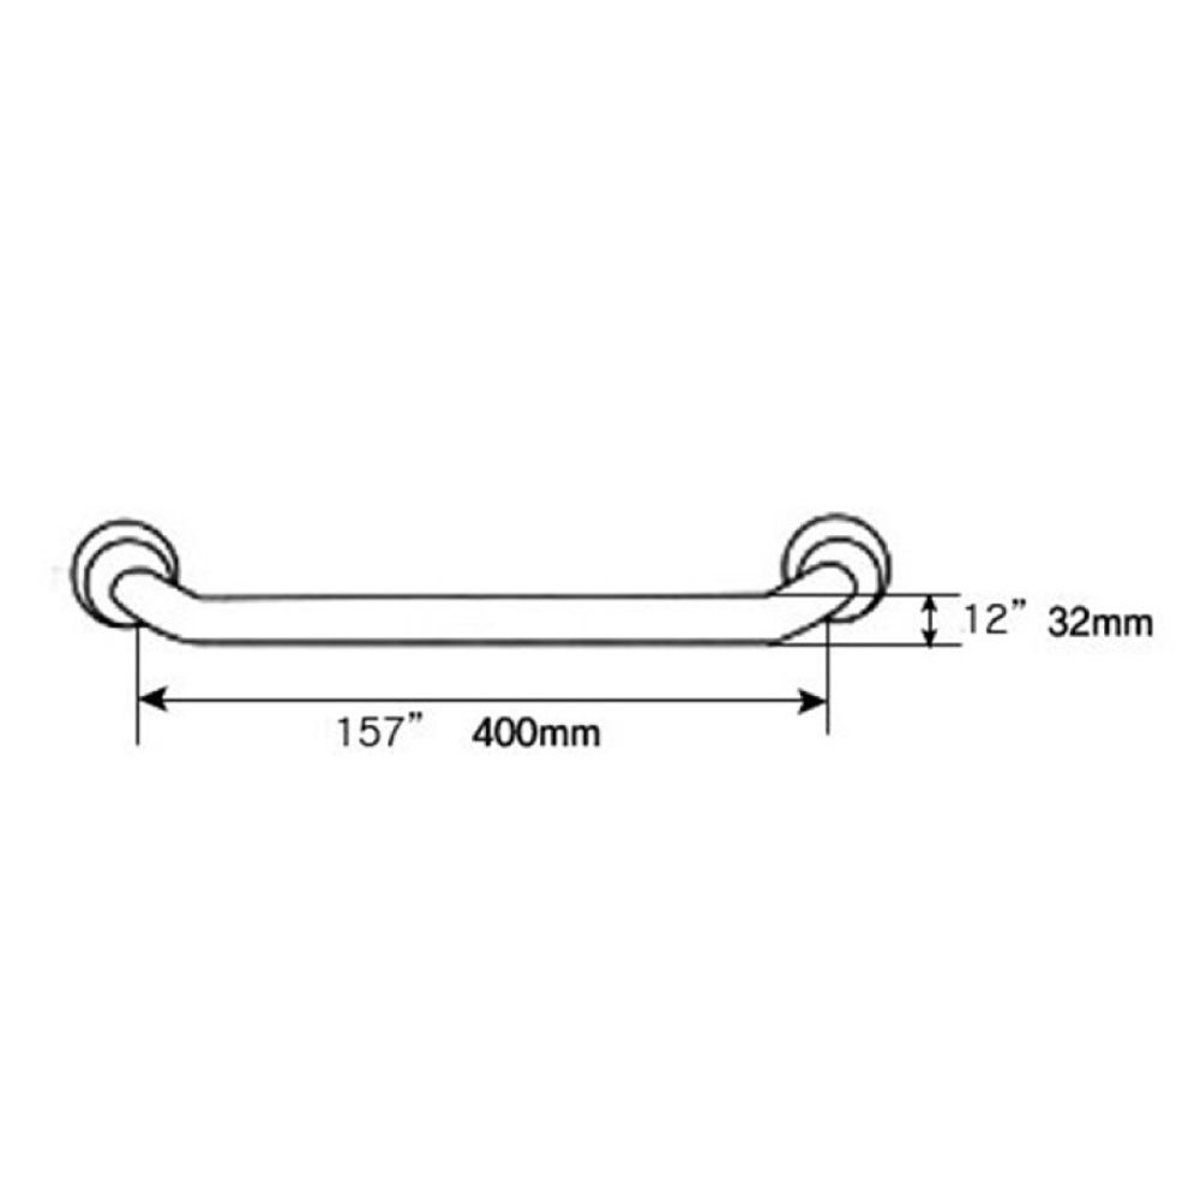 RAK Straight Grab Rail 400mm Measurements